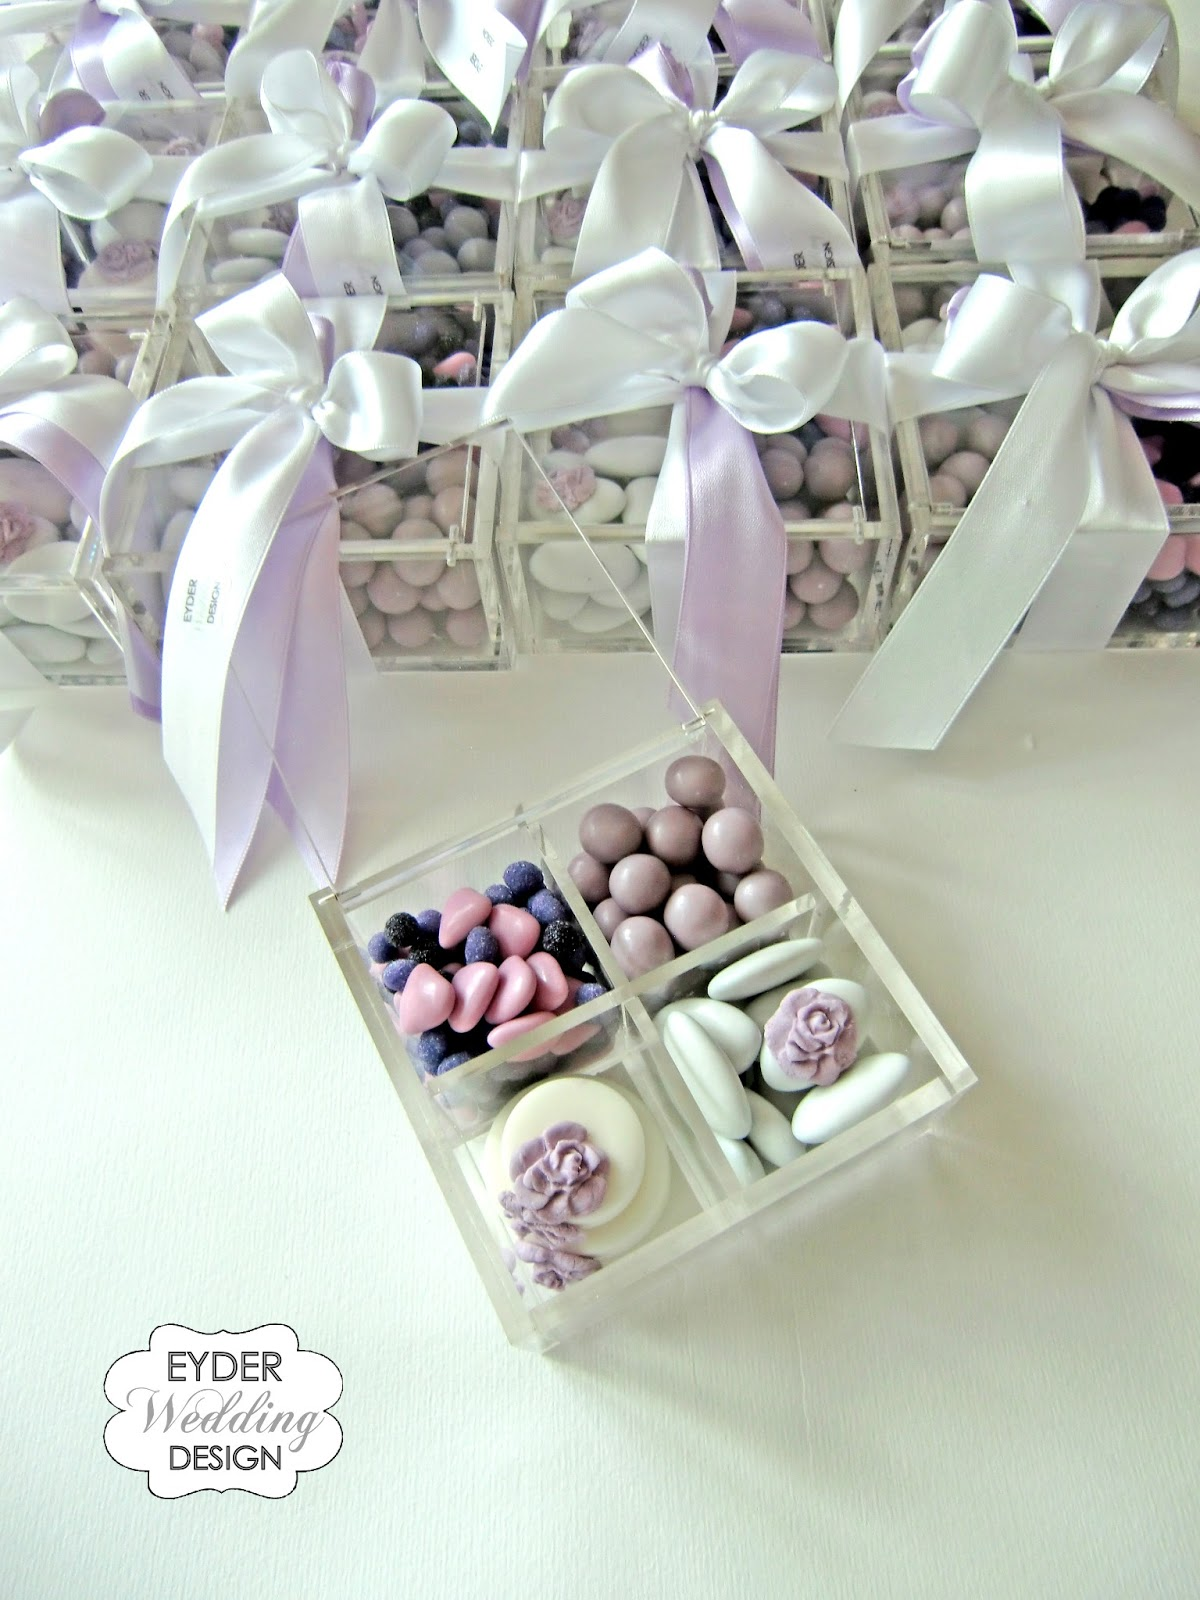 Connu EYDER Wedding DESIGN: Scatole degustazione e bomboniere in plexiglass VF99